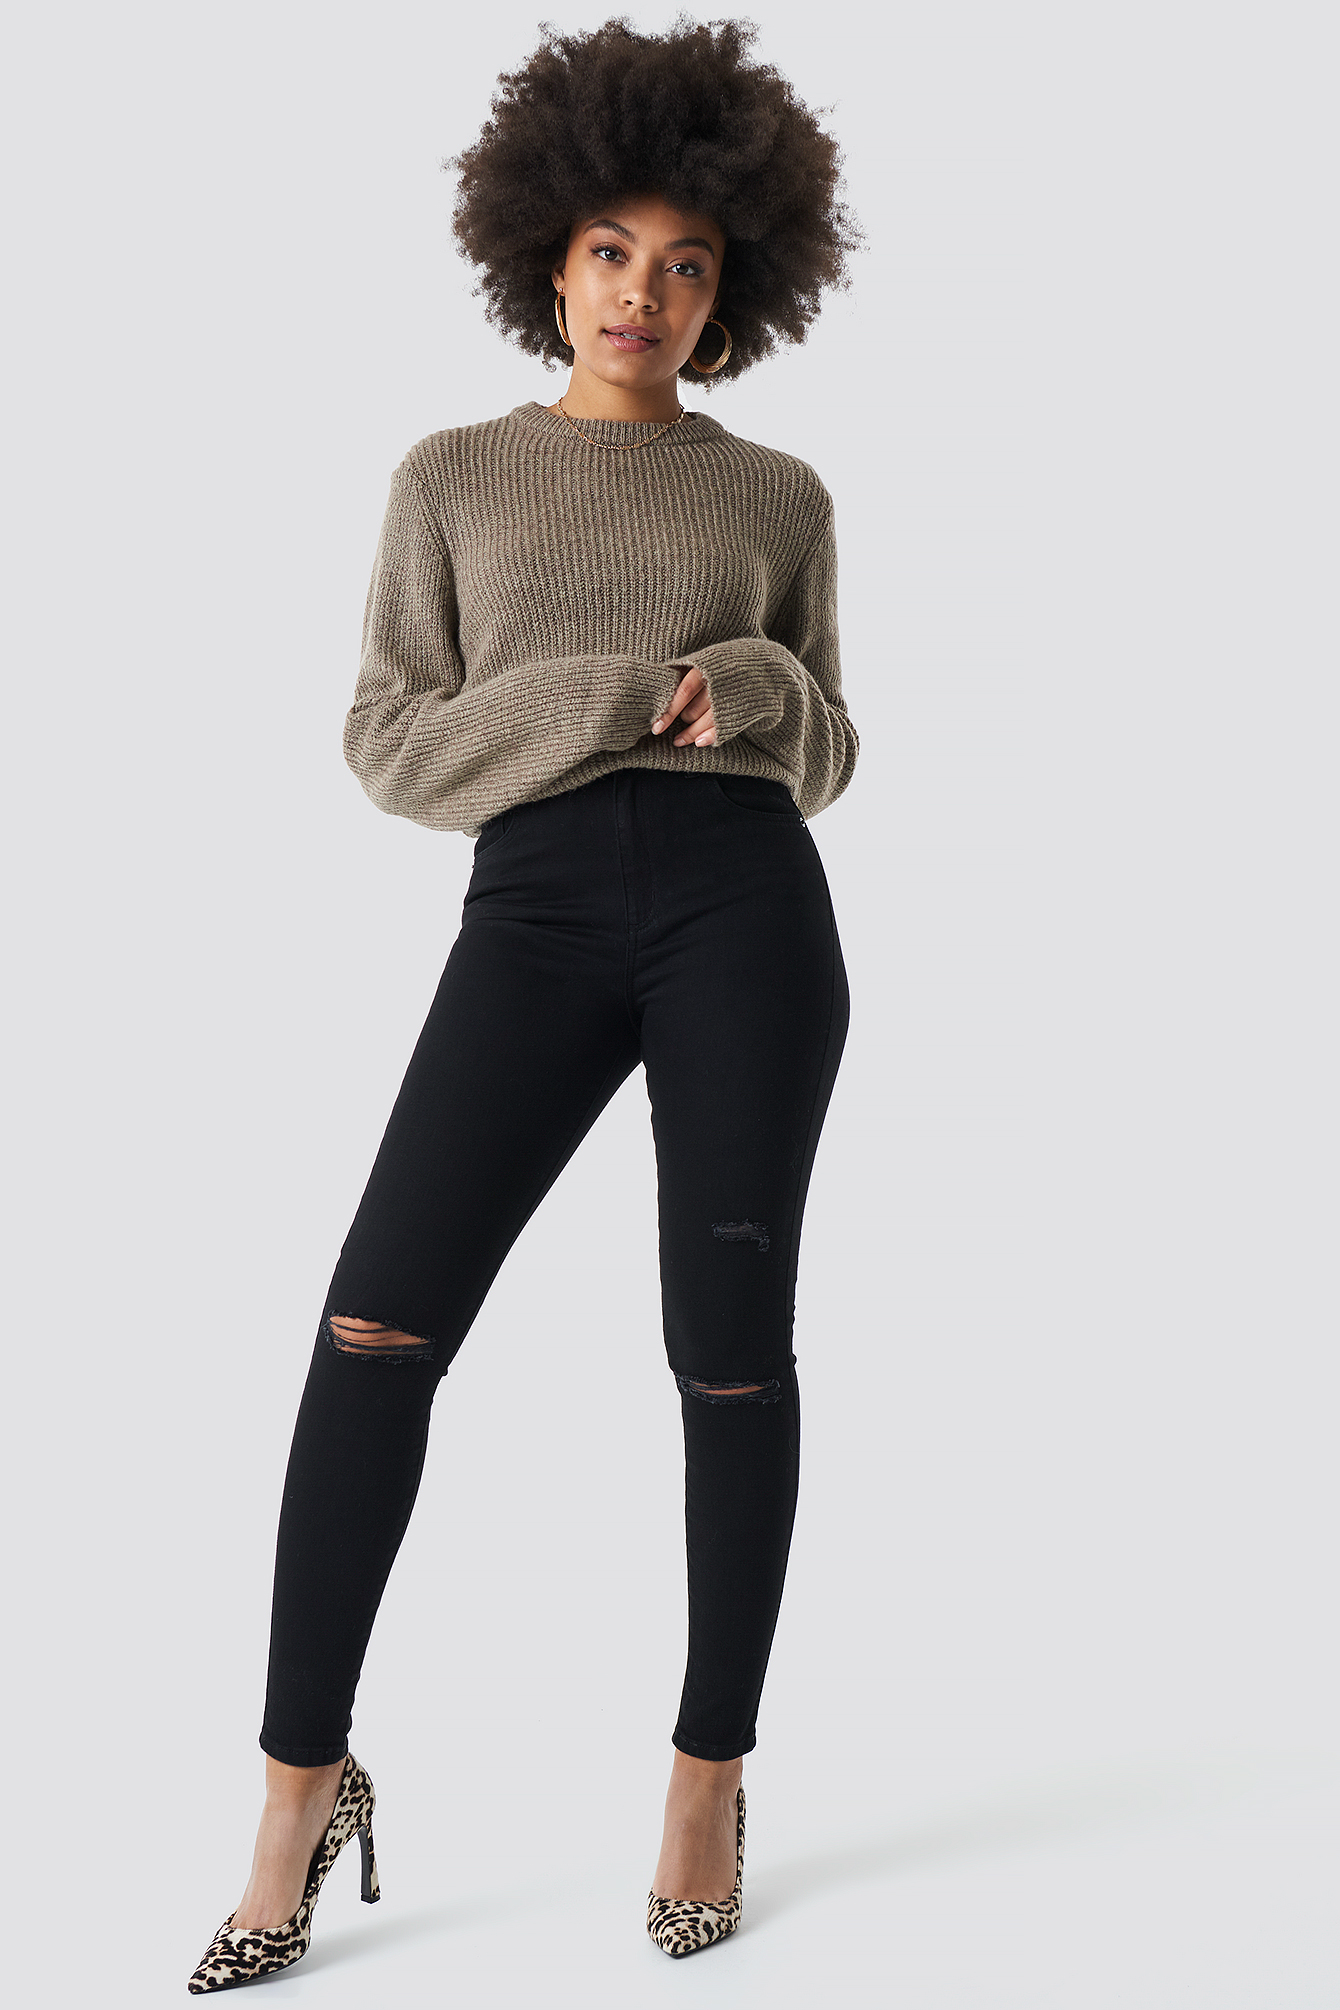 High Waist Knee Rip Super Skinny Jeans by Na Kd Trend